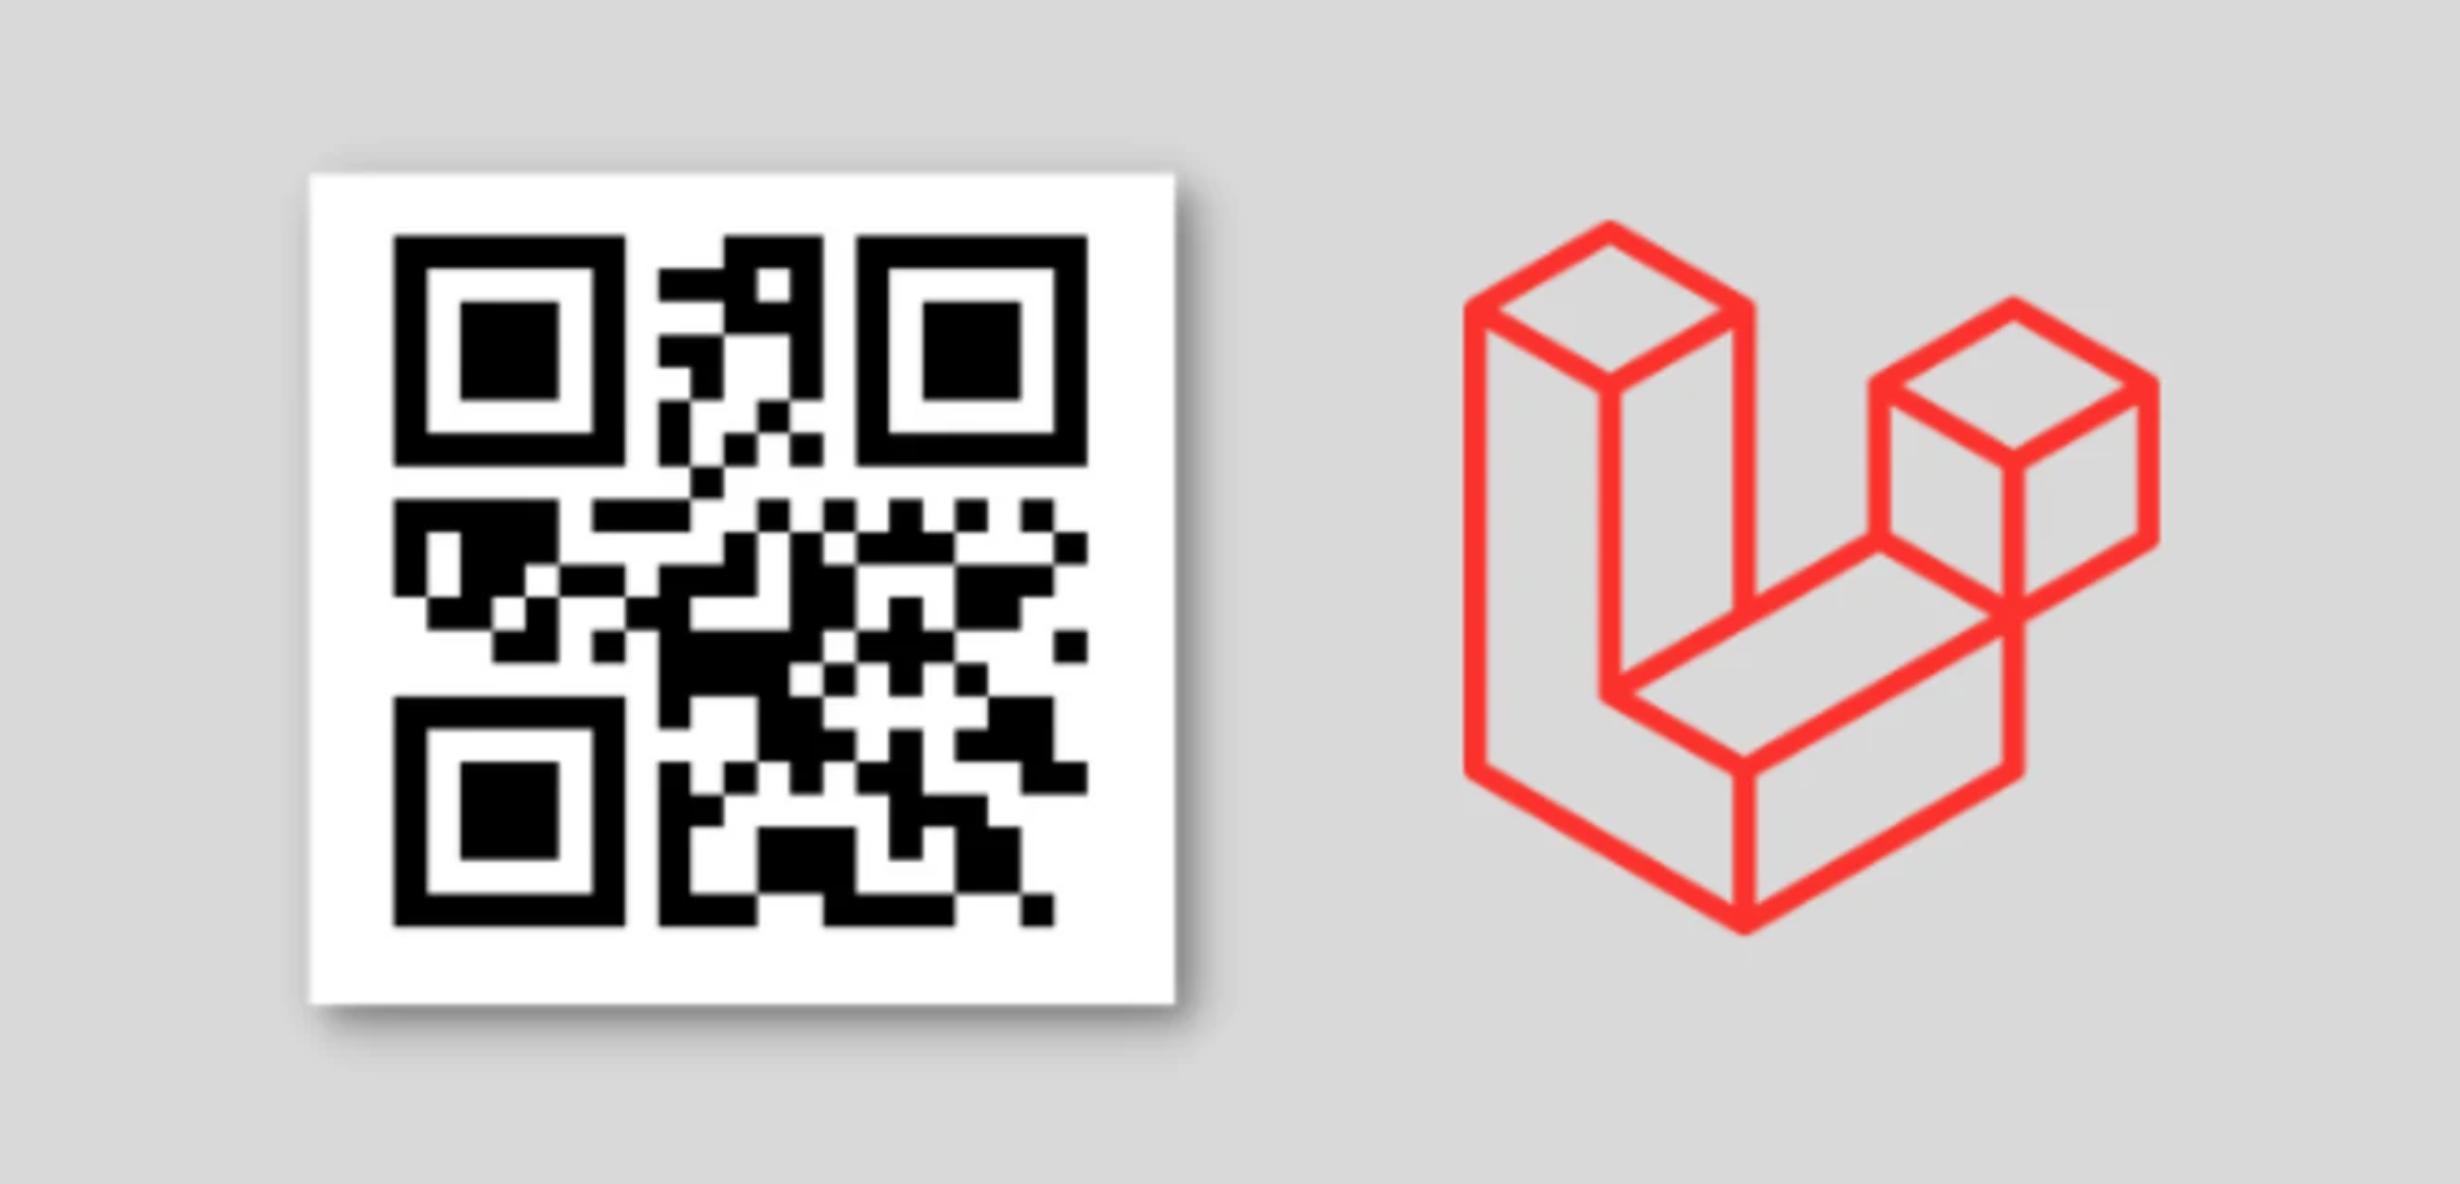 generate-qr-code-generate-with-laravel-pa9qh